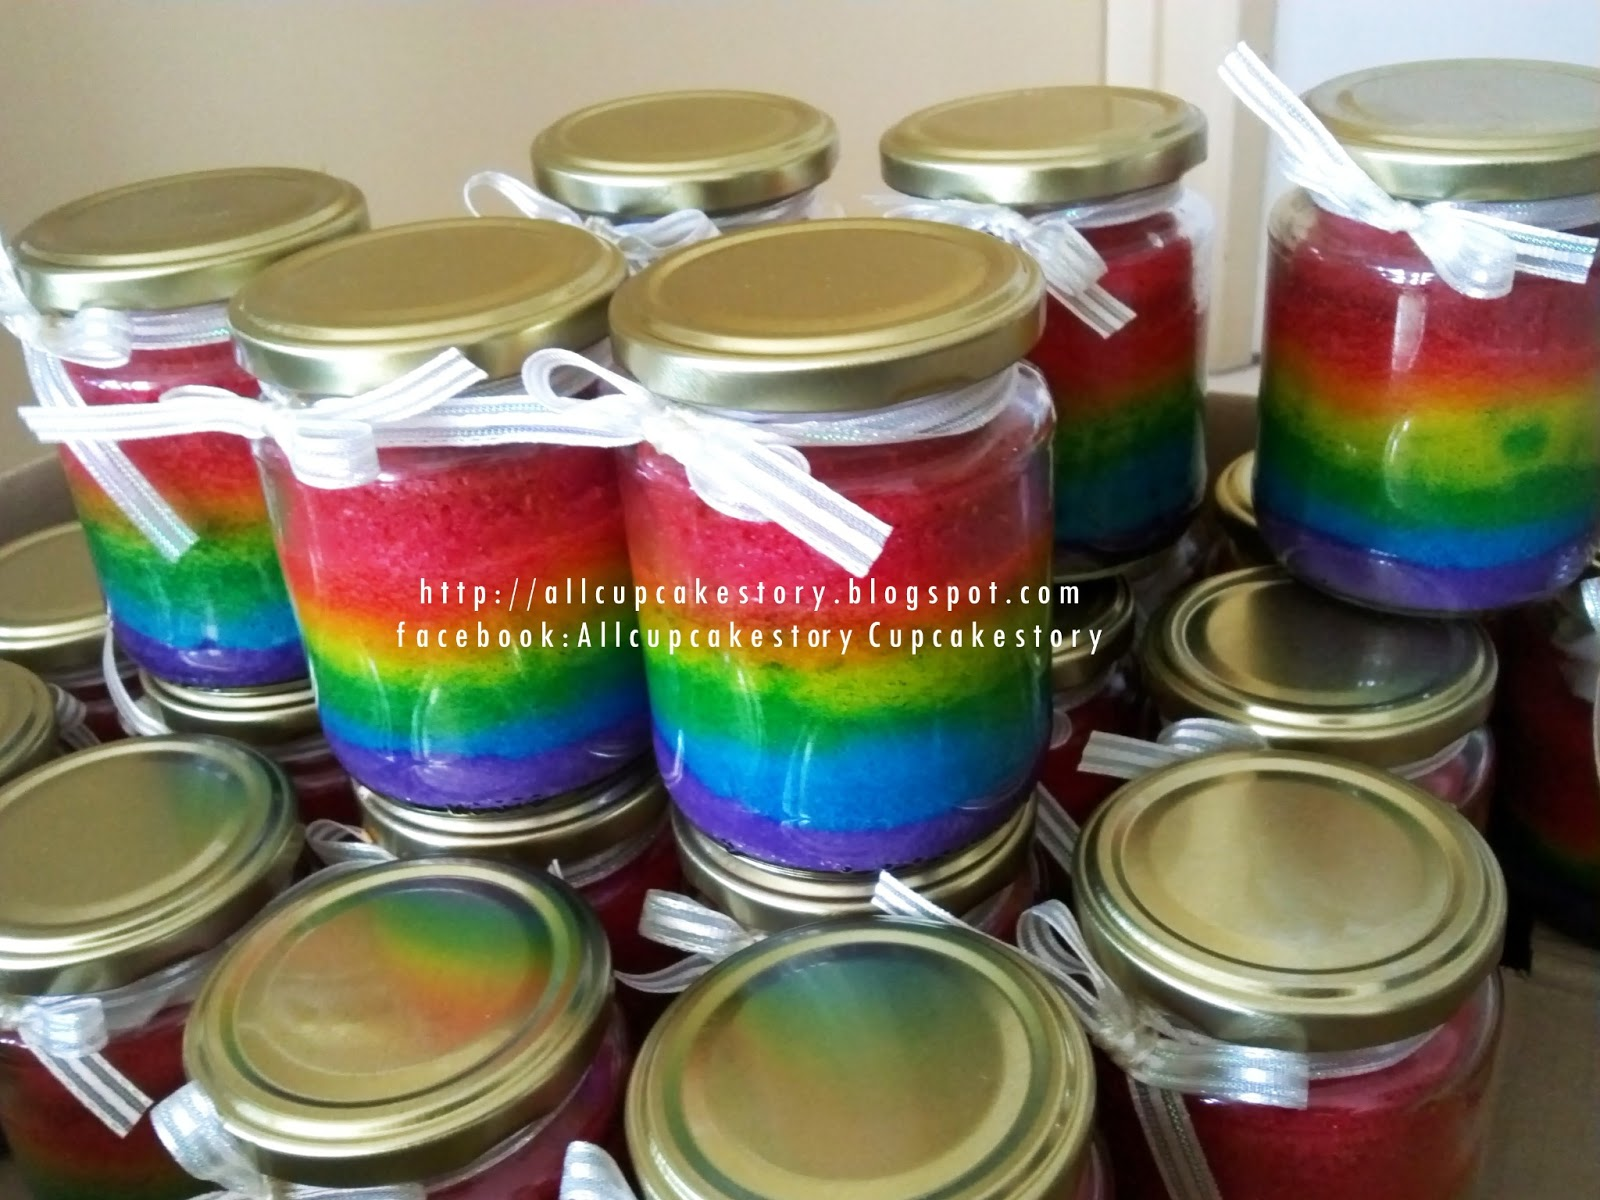 Resep Cake In Jar Rainbow: Allcupcakestory: Rainbow Cake In Jar